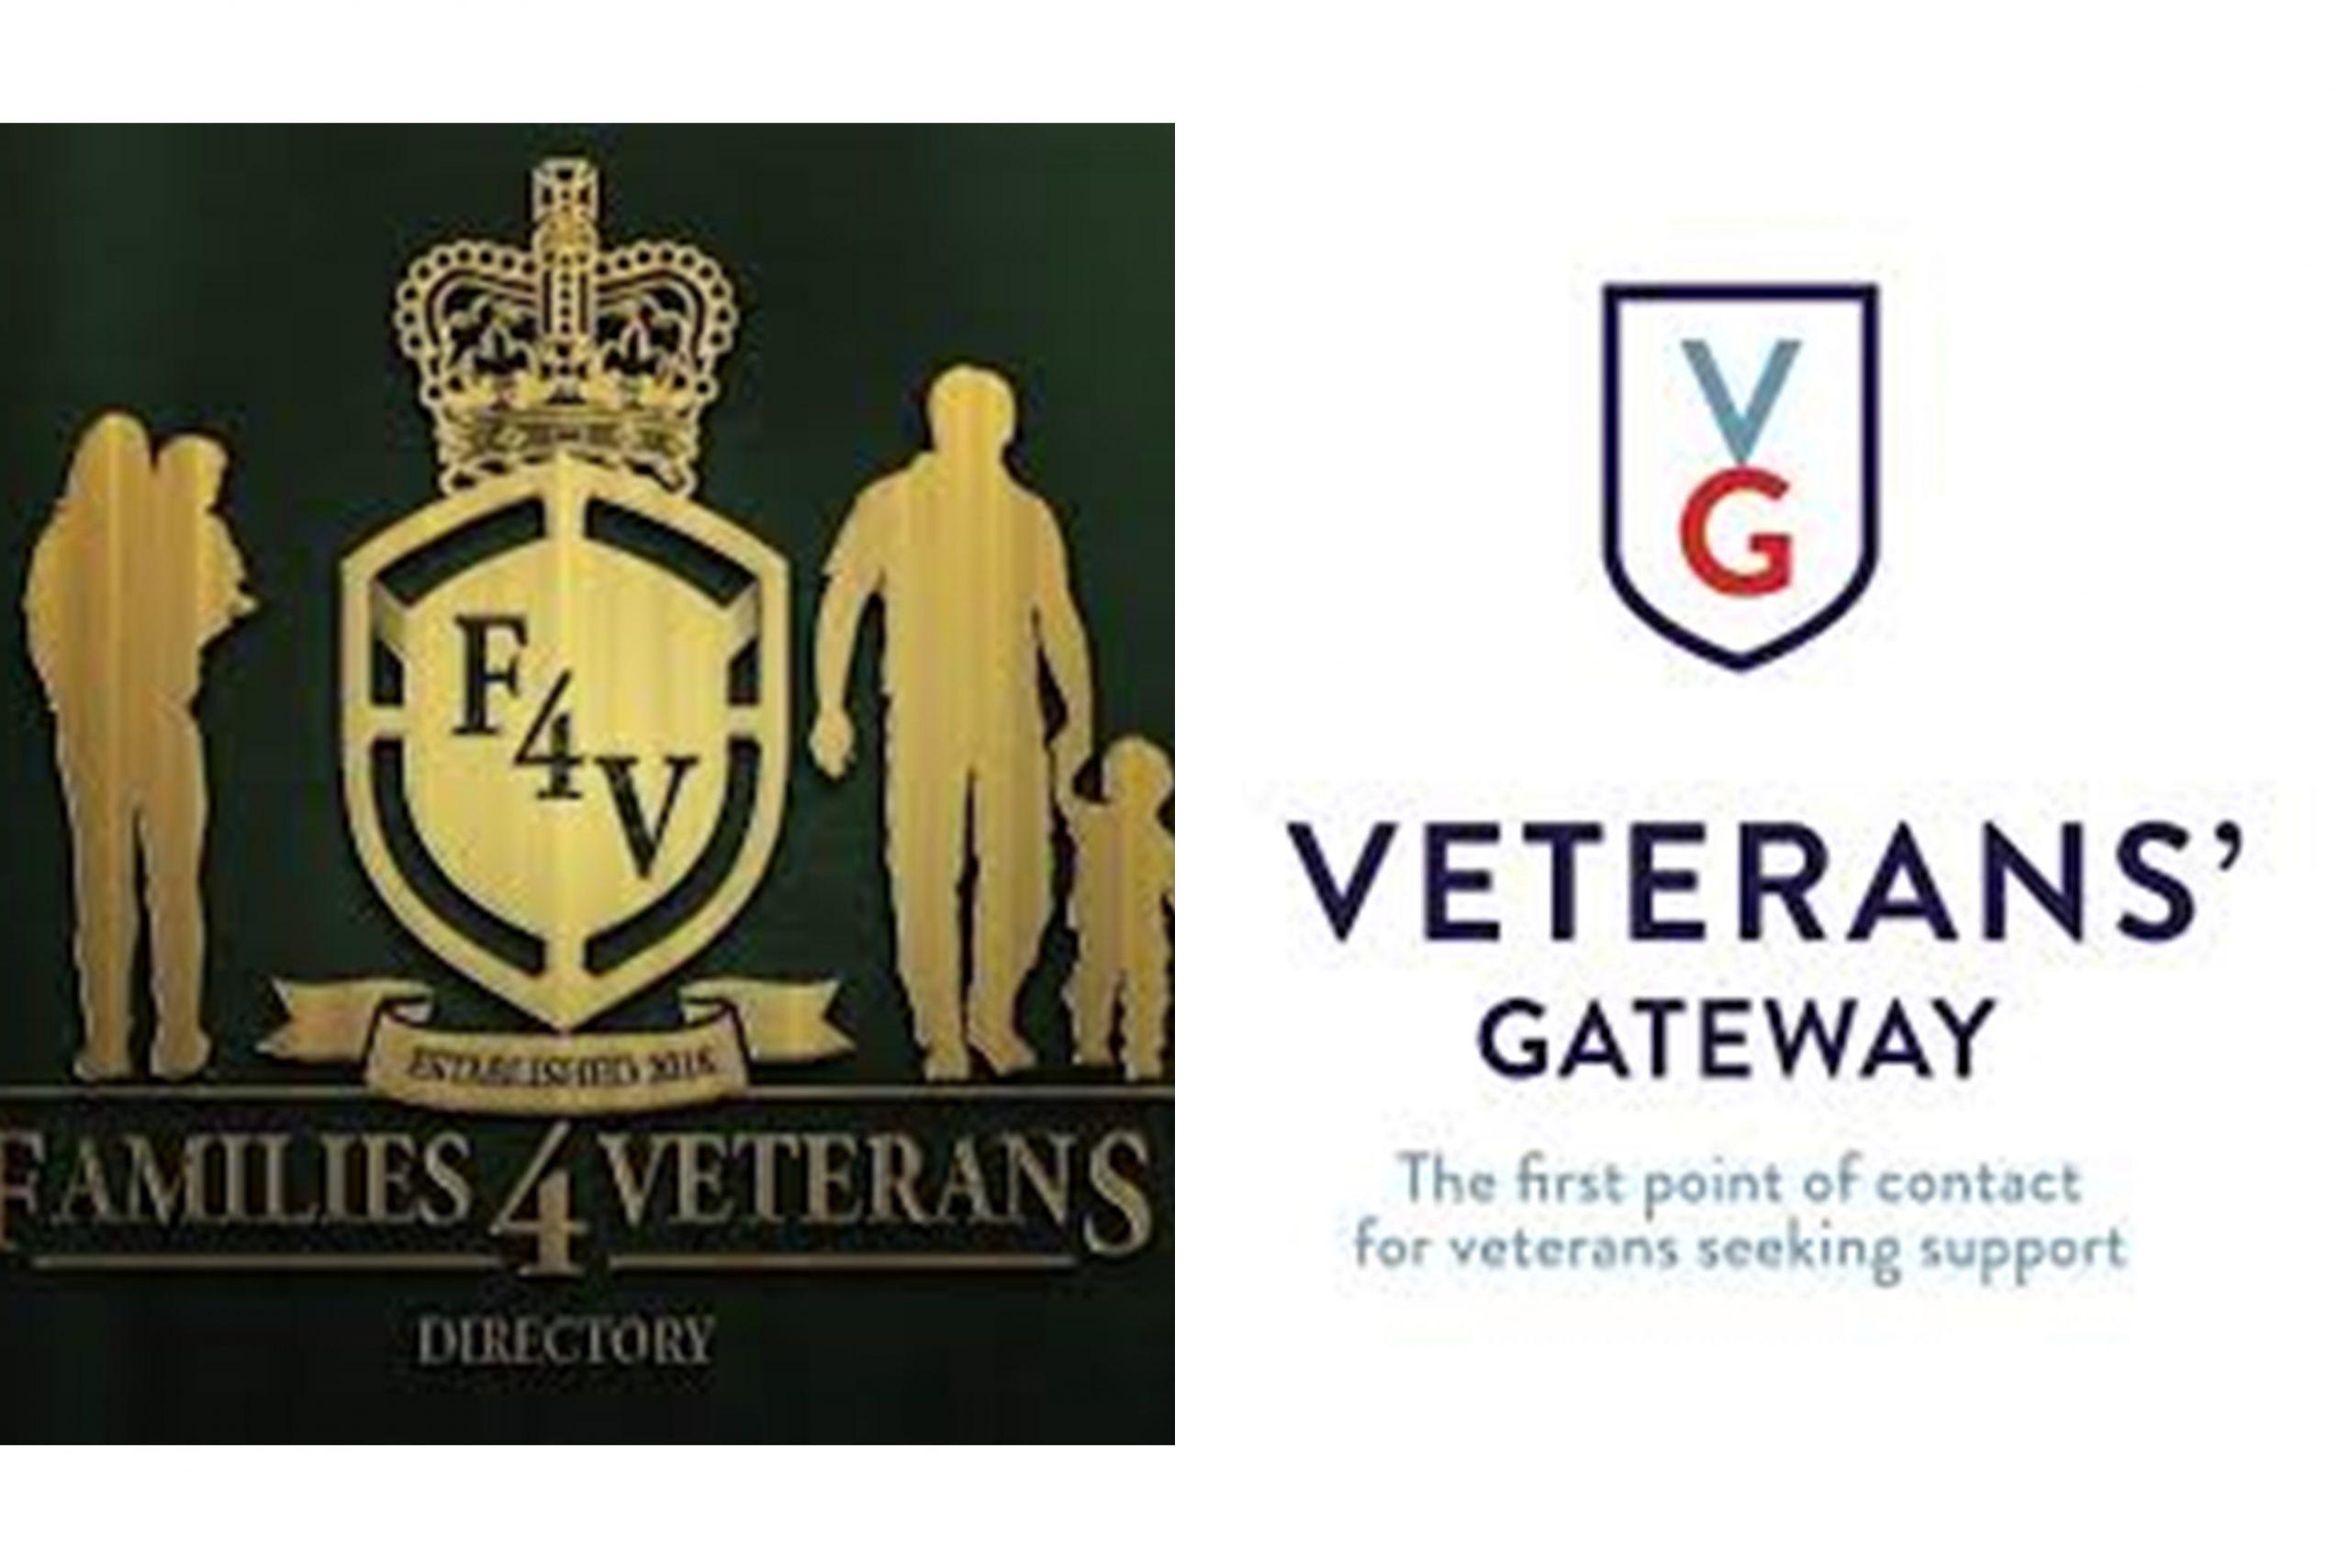 Veterans directory listings